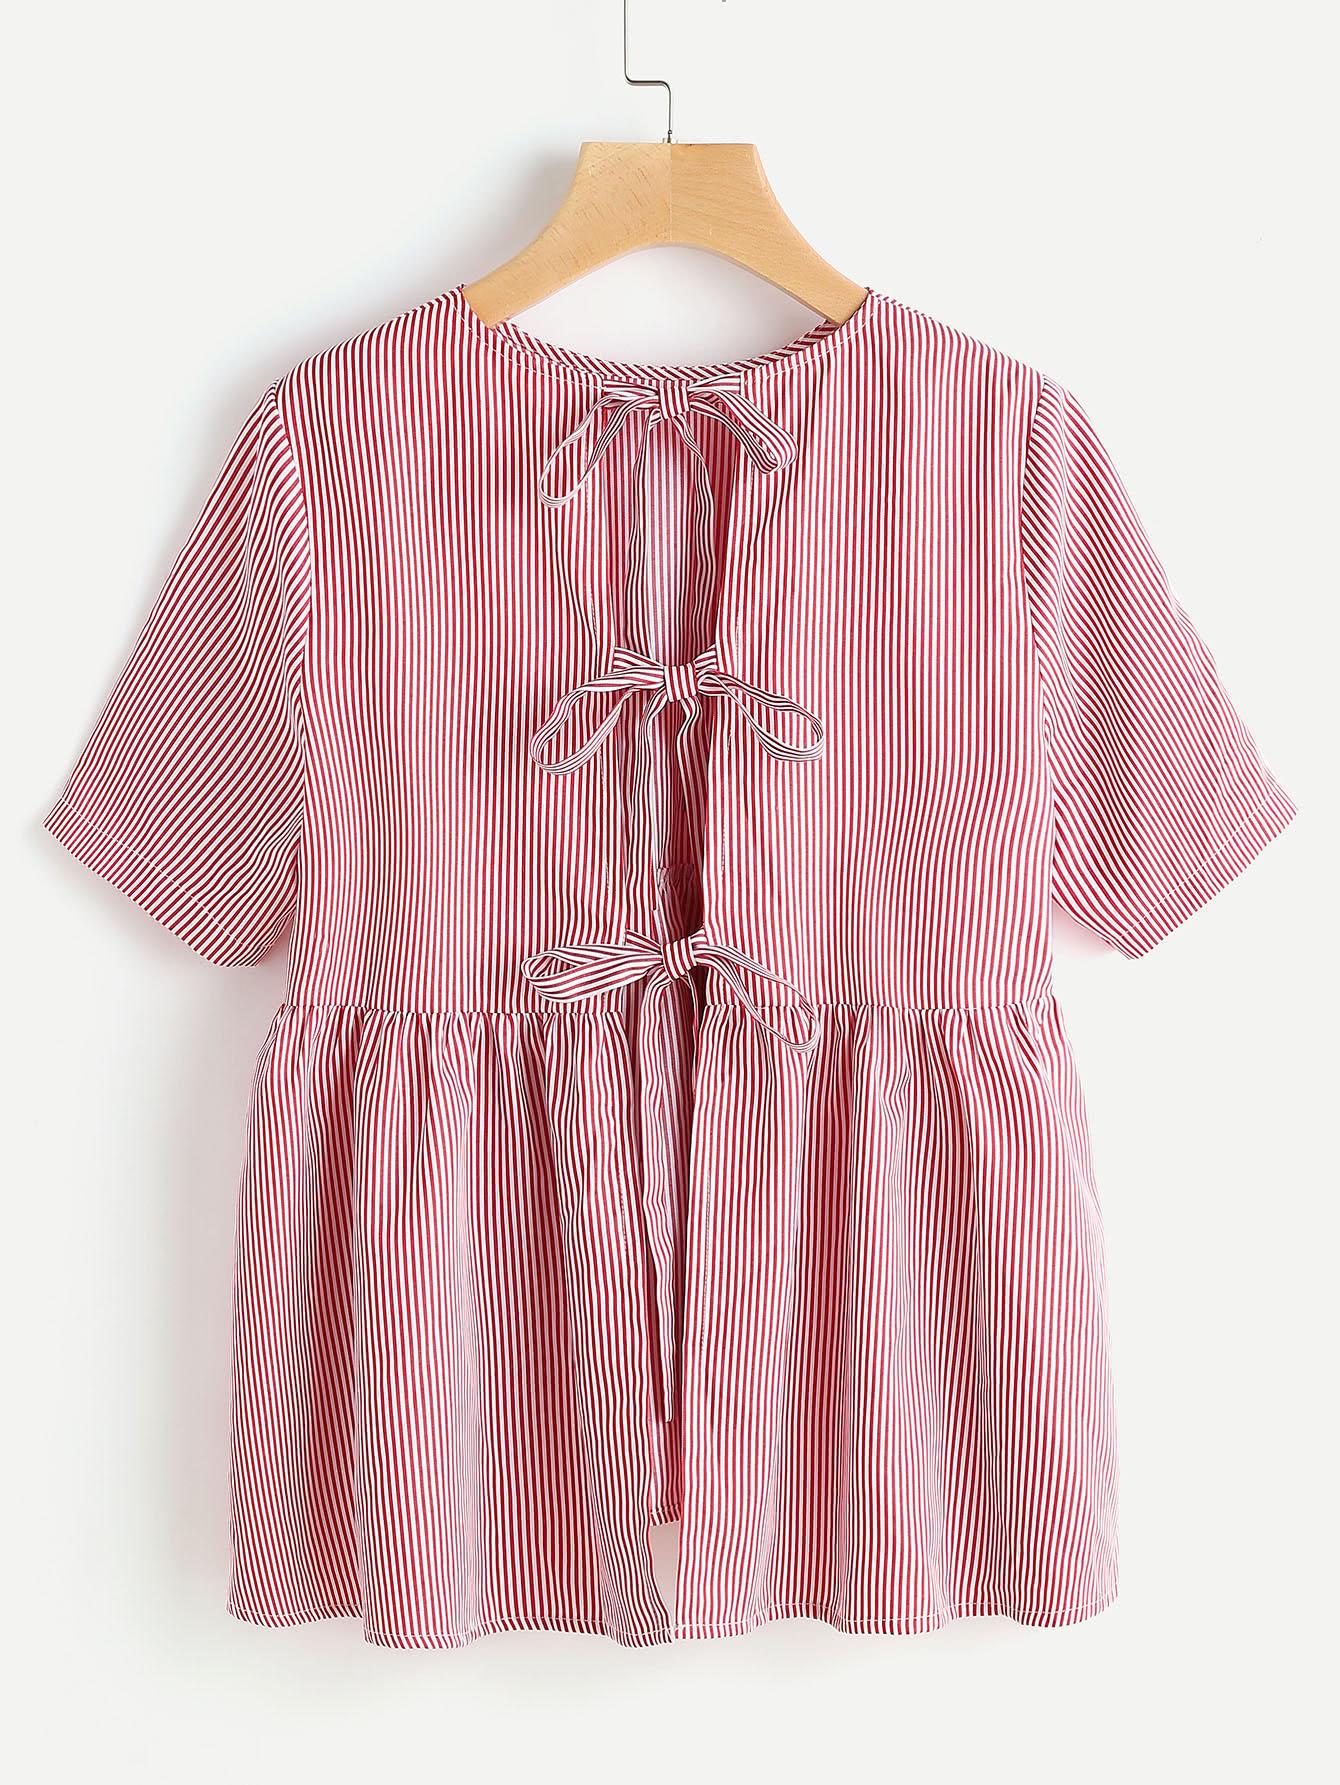 Split Bow Tie Back Striped Babydoll Top blouse170420703